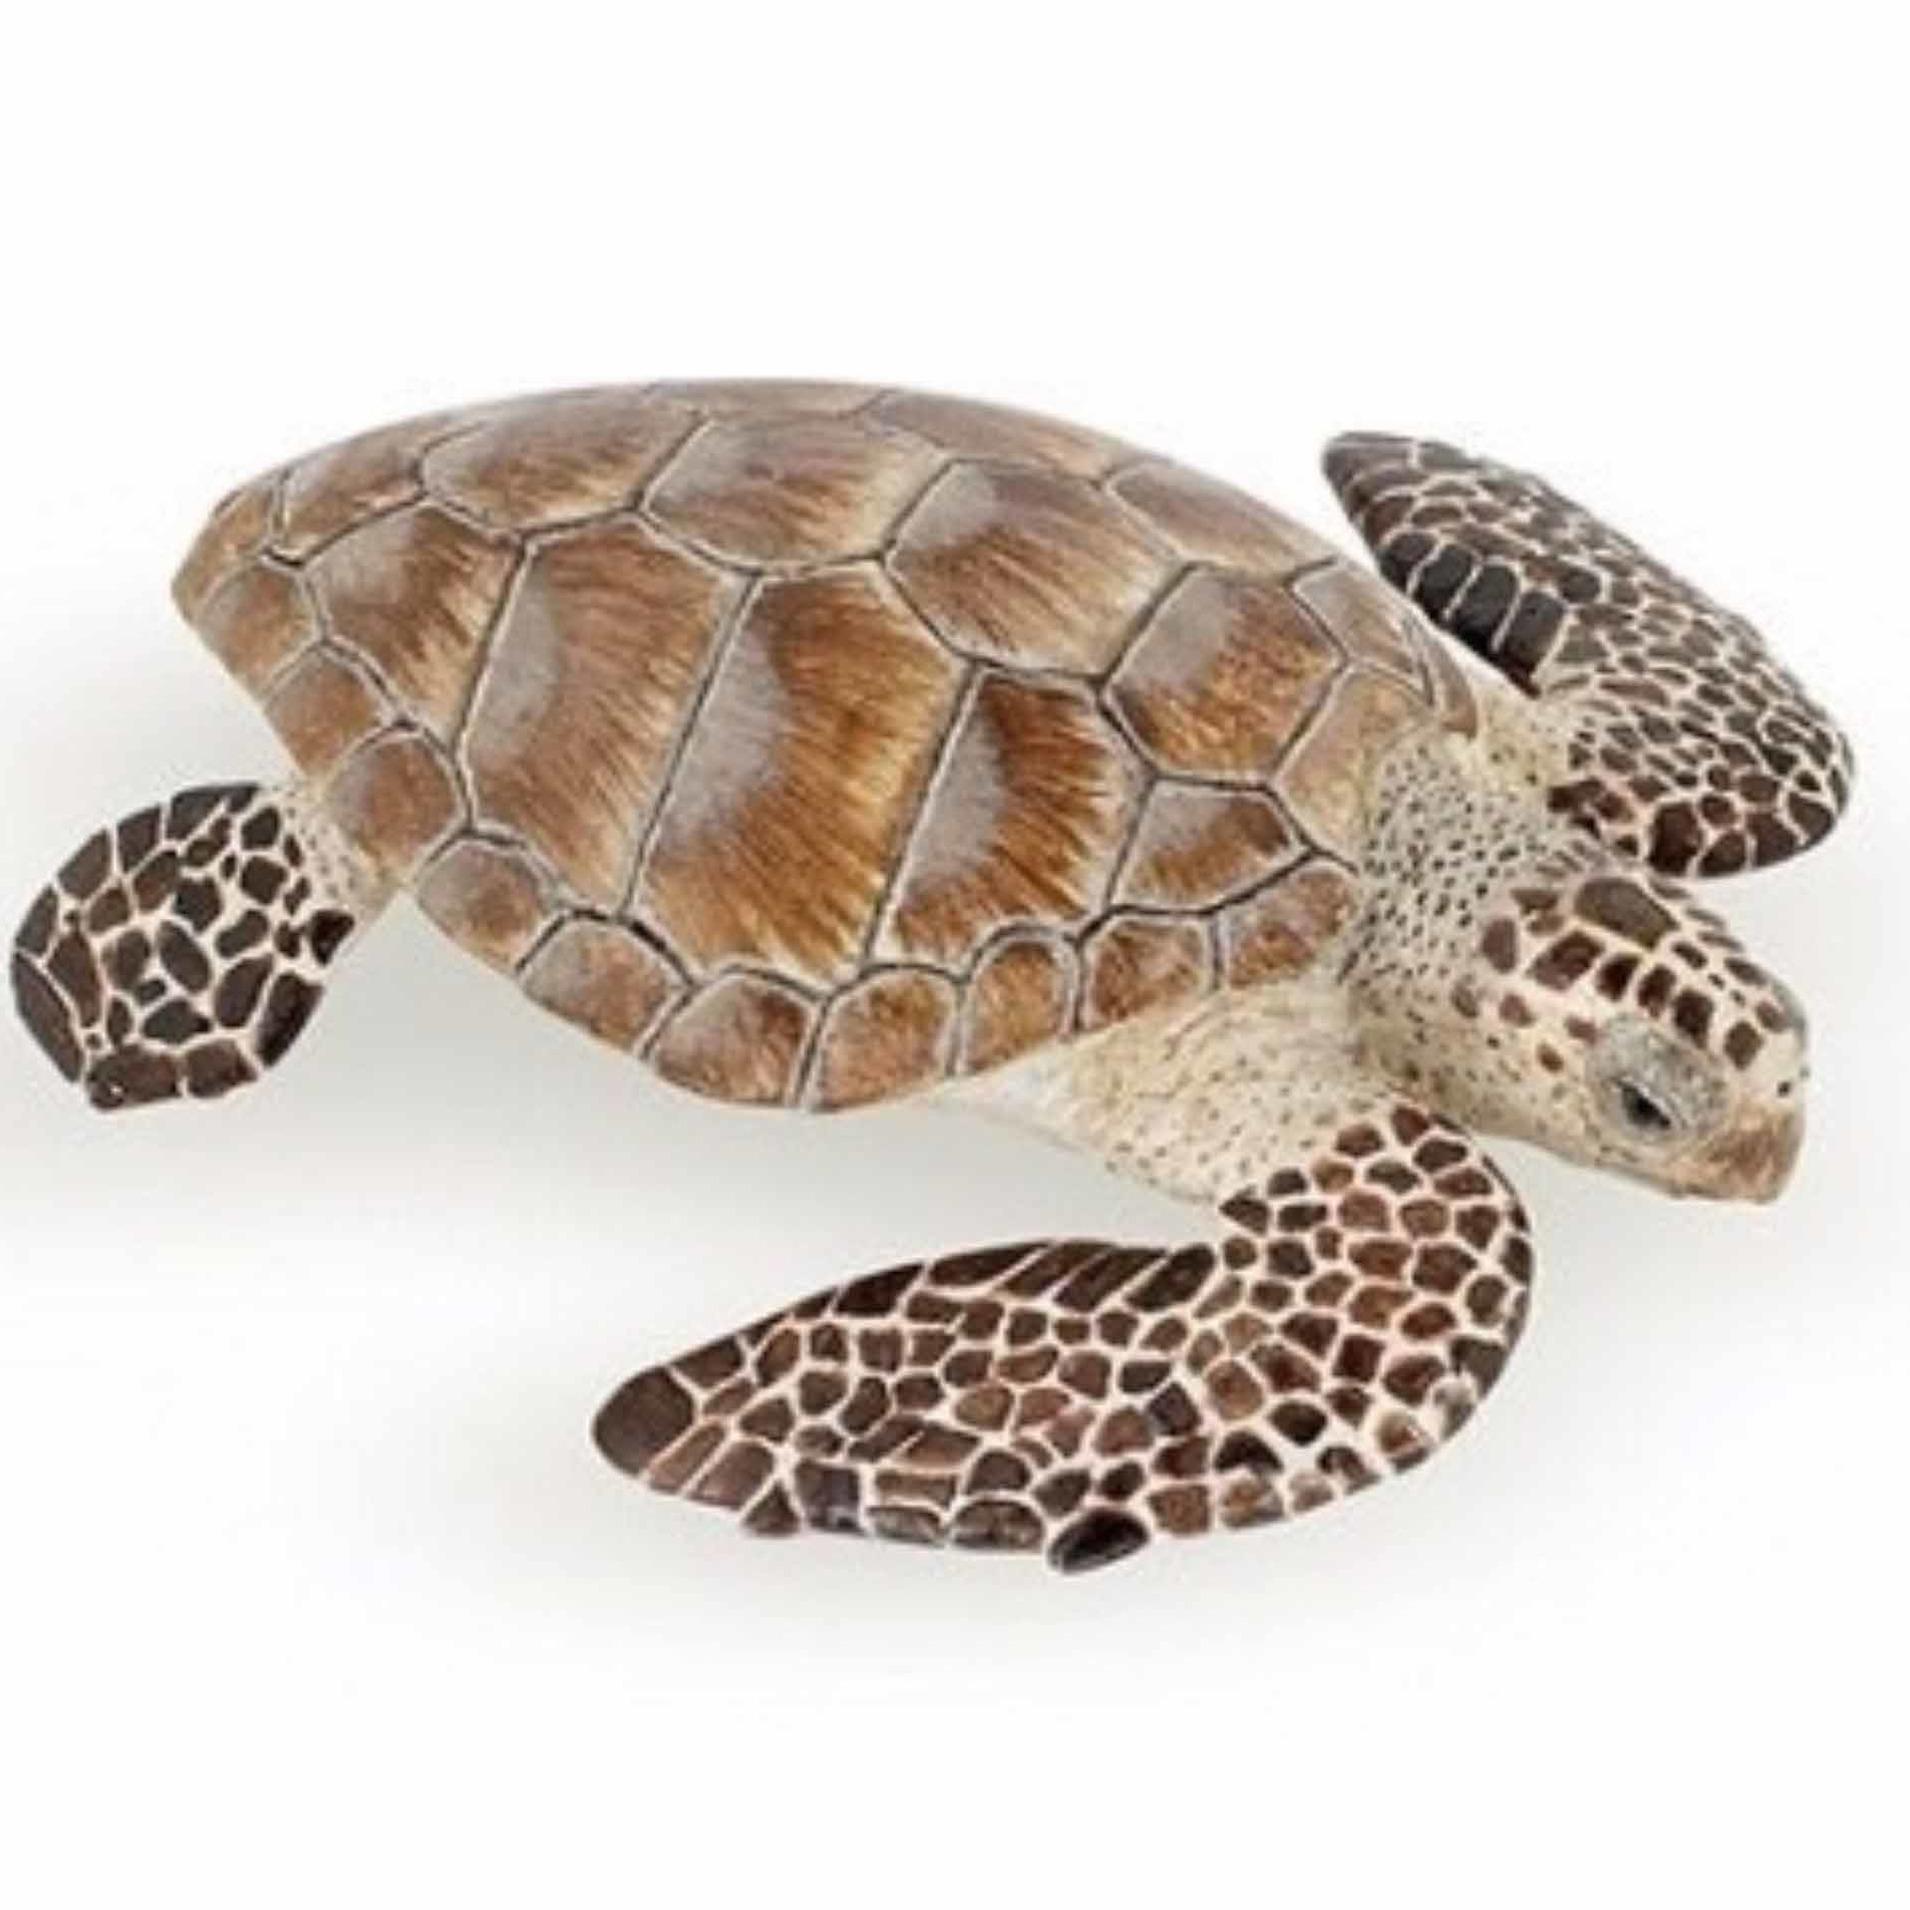 Plastic Papo dier karetschildpad 7,5 cm